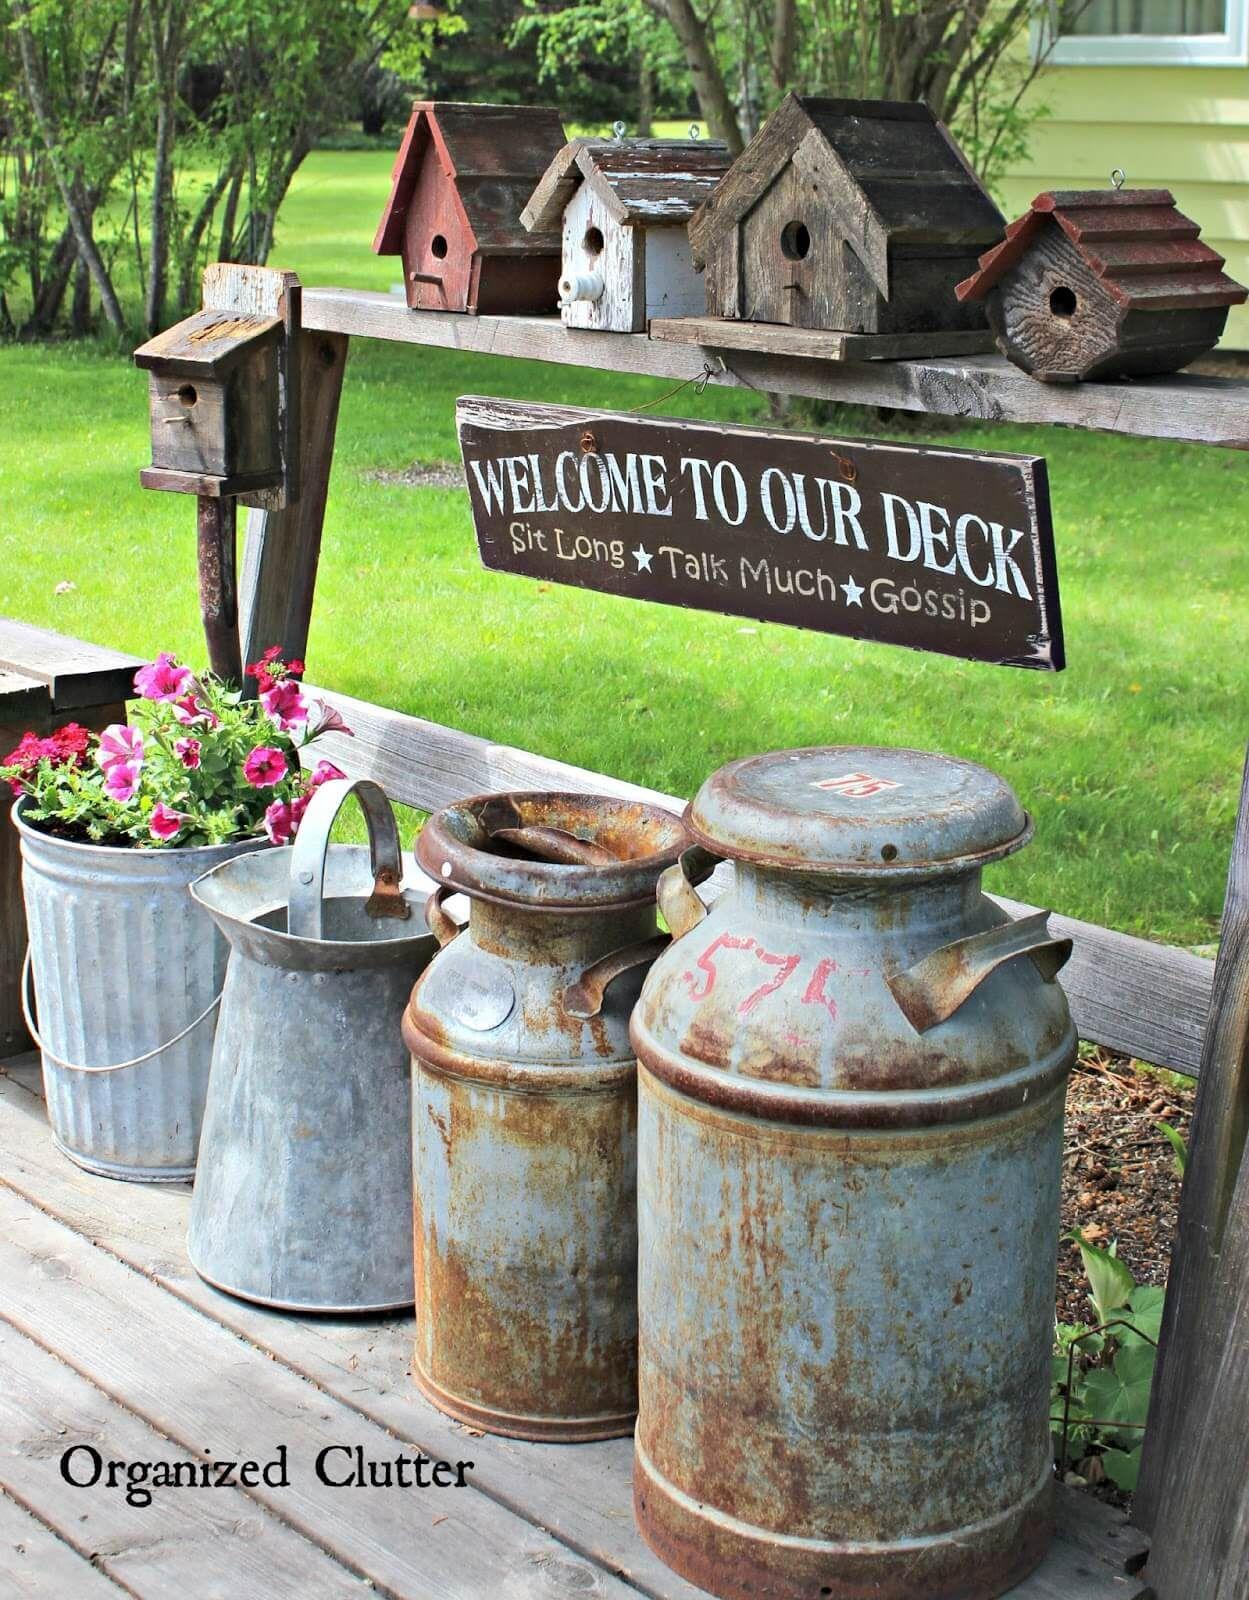 Vintage Garden Decor Ideas: Vintage Birdhouse And Milk Can Decor Idea